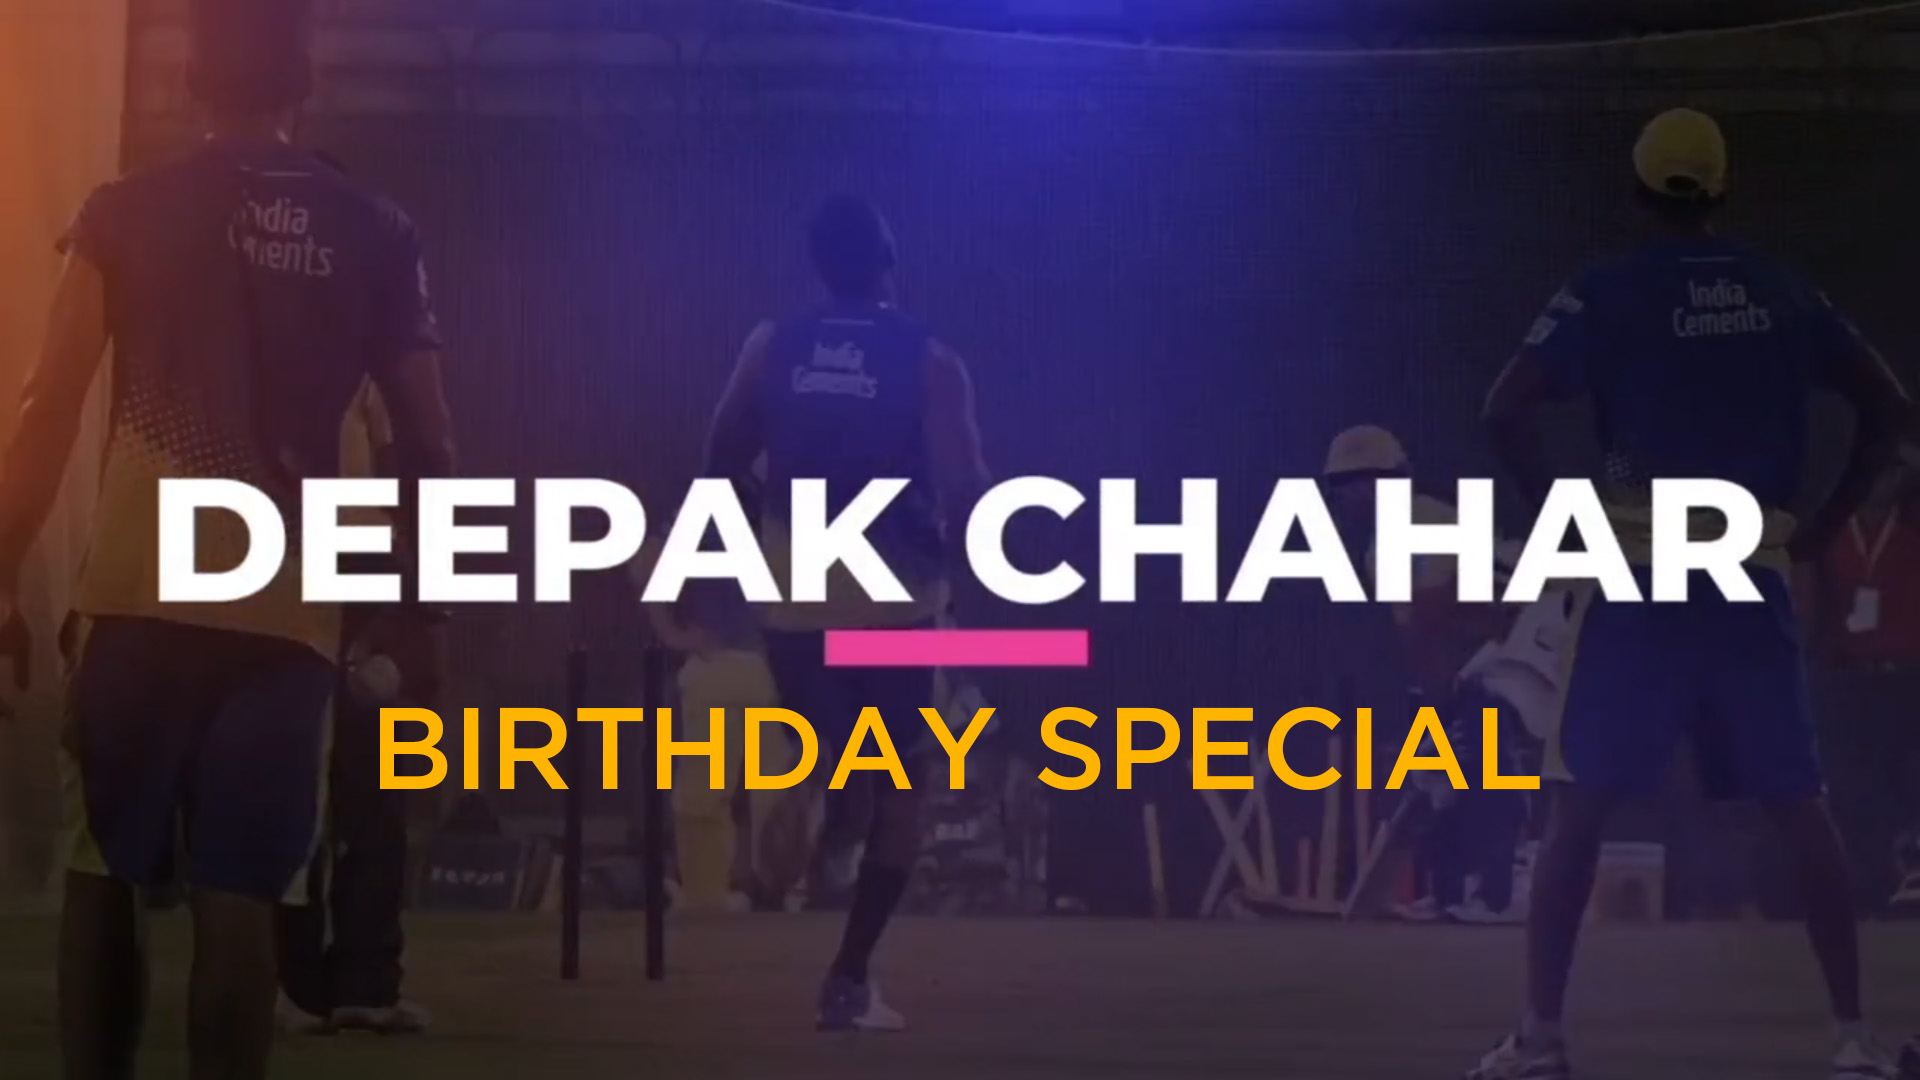 Chennai Super Kings- Videos, Shop, News, Live Scores,Tickets